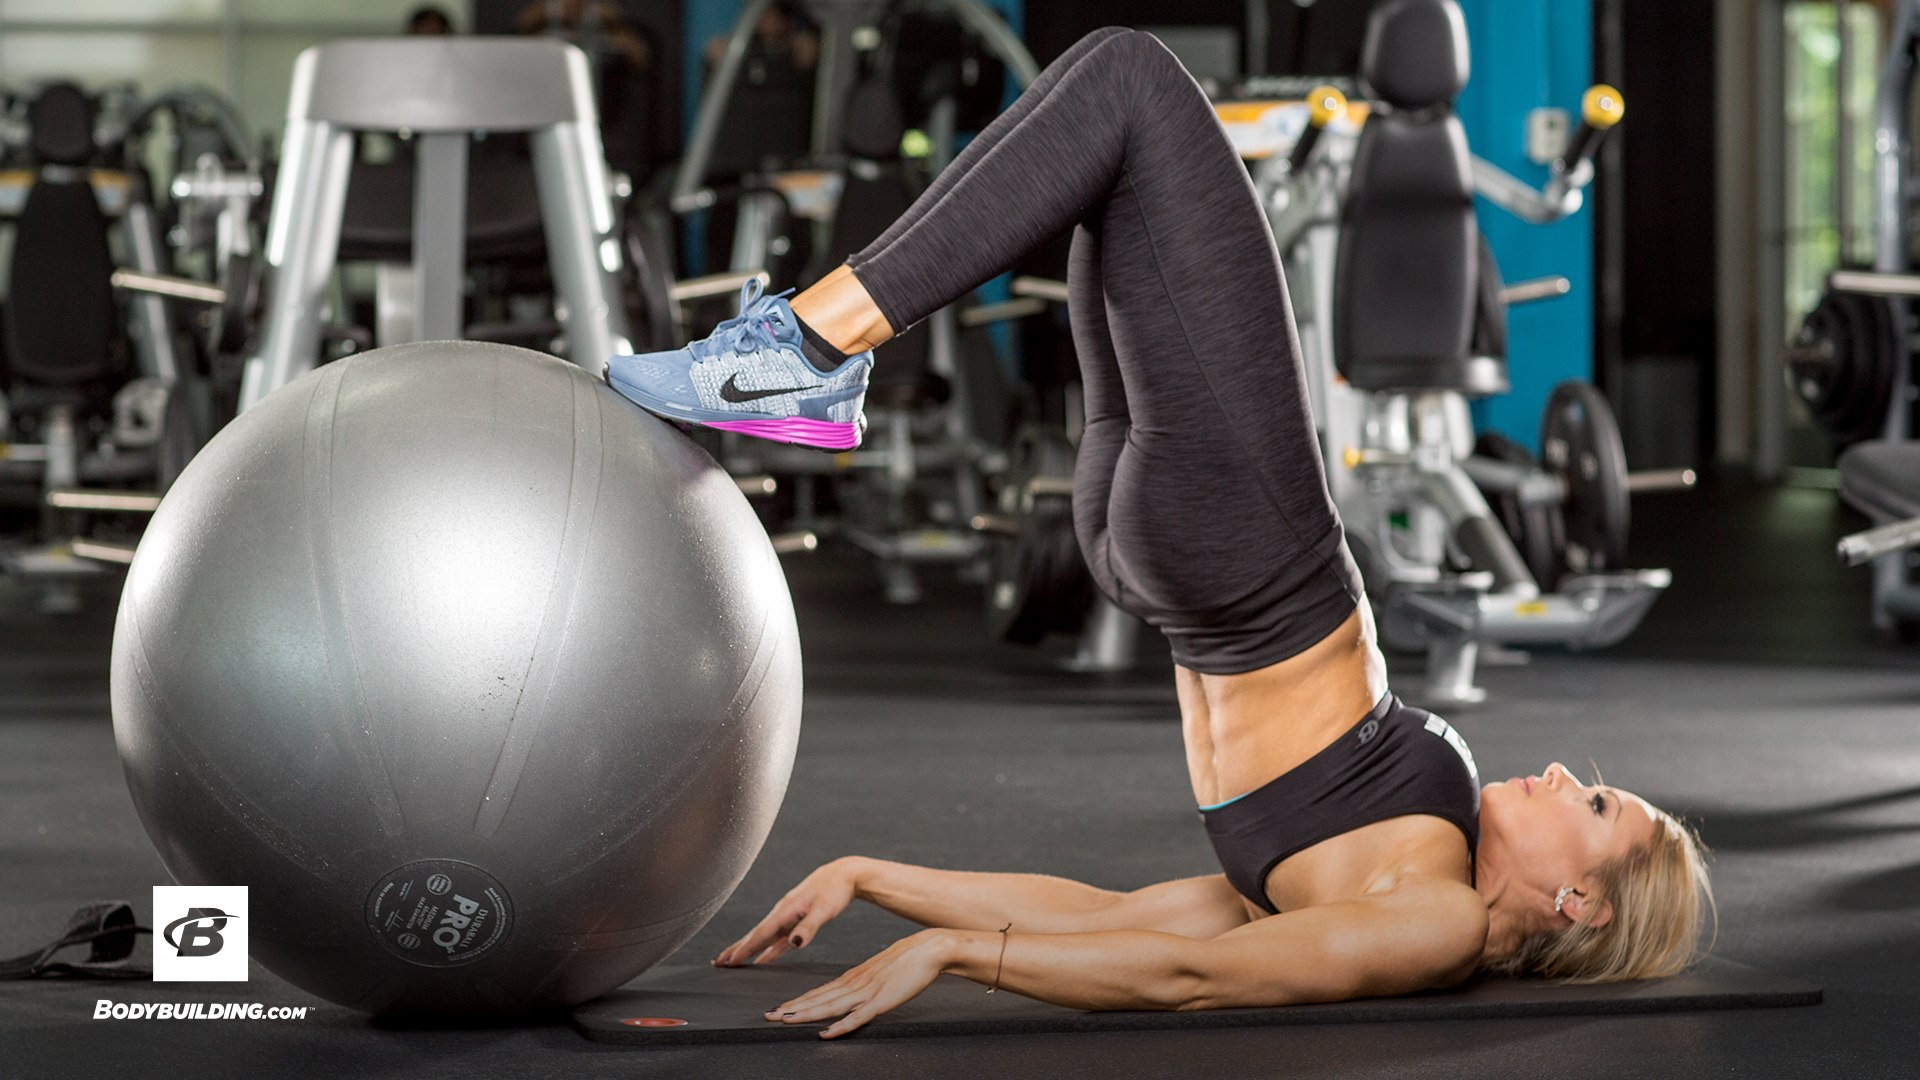 foto tréning zadok a stehná